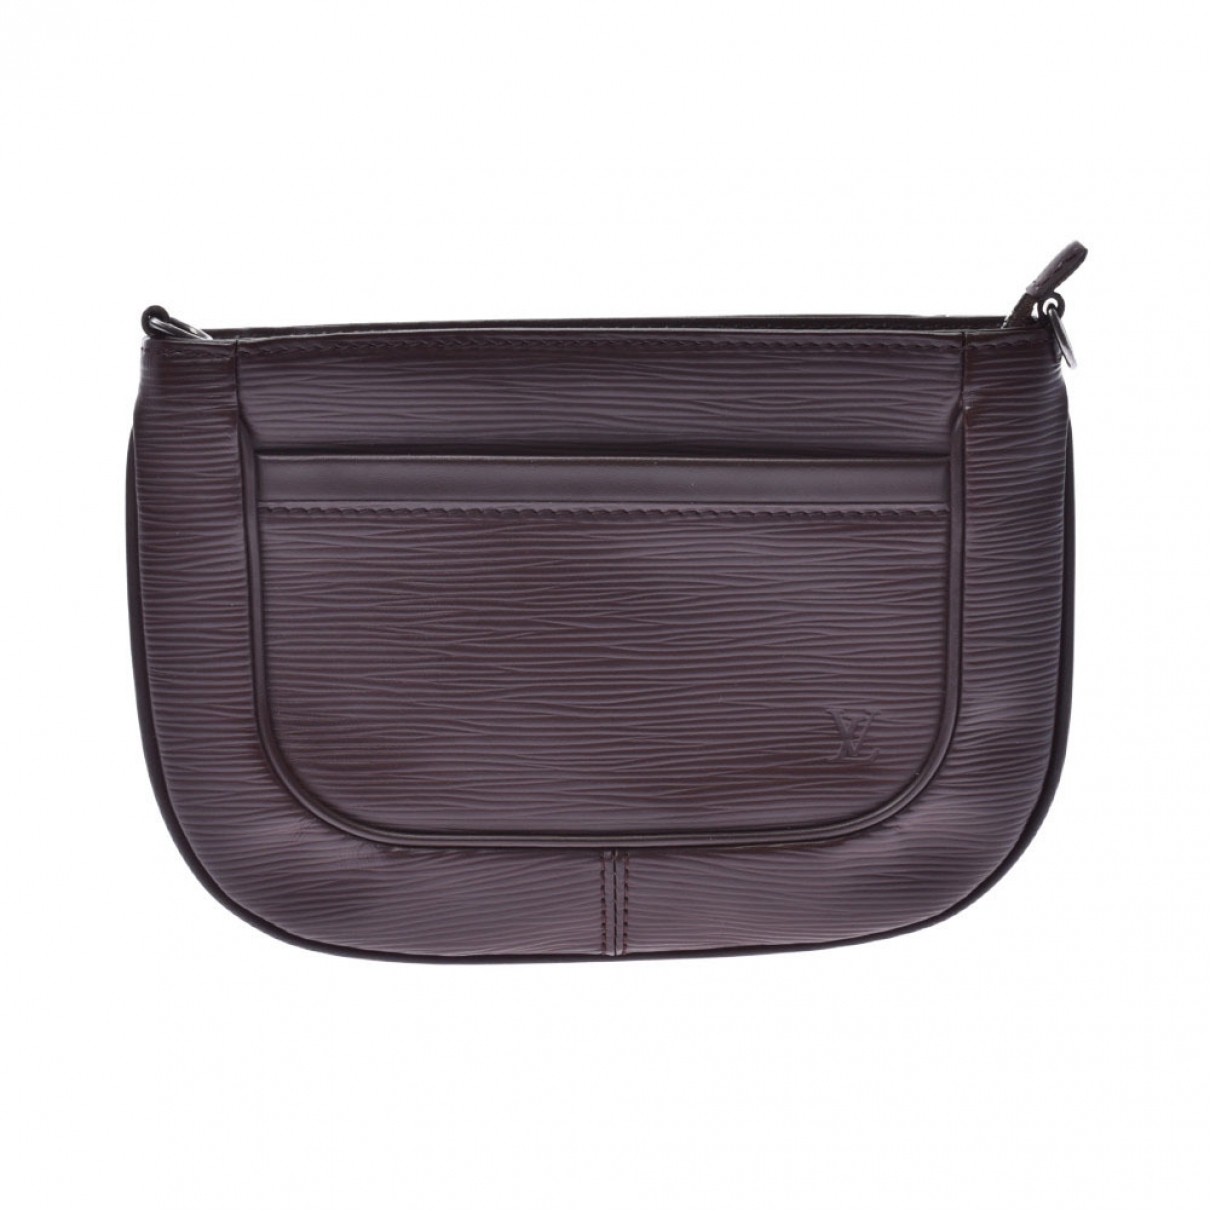 Bandolera Sarvanga de Cuero Louis Vuitton